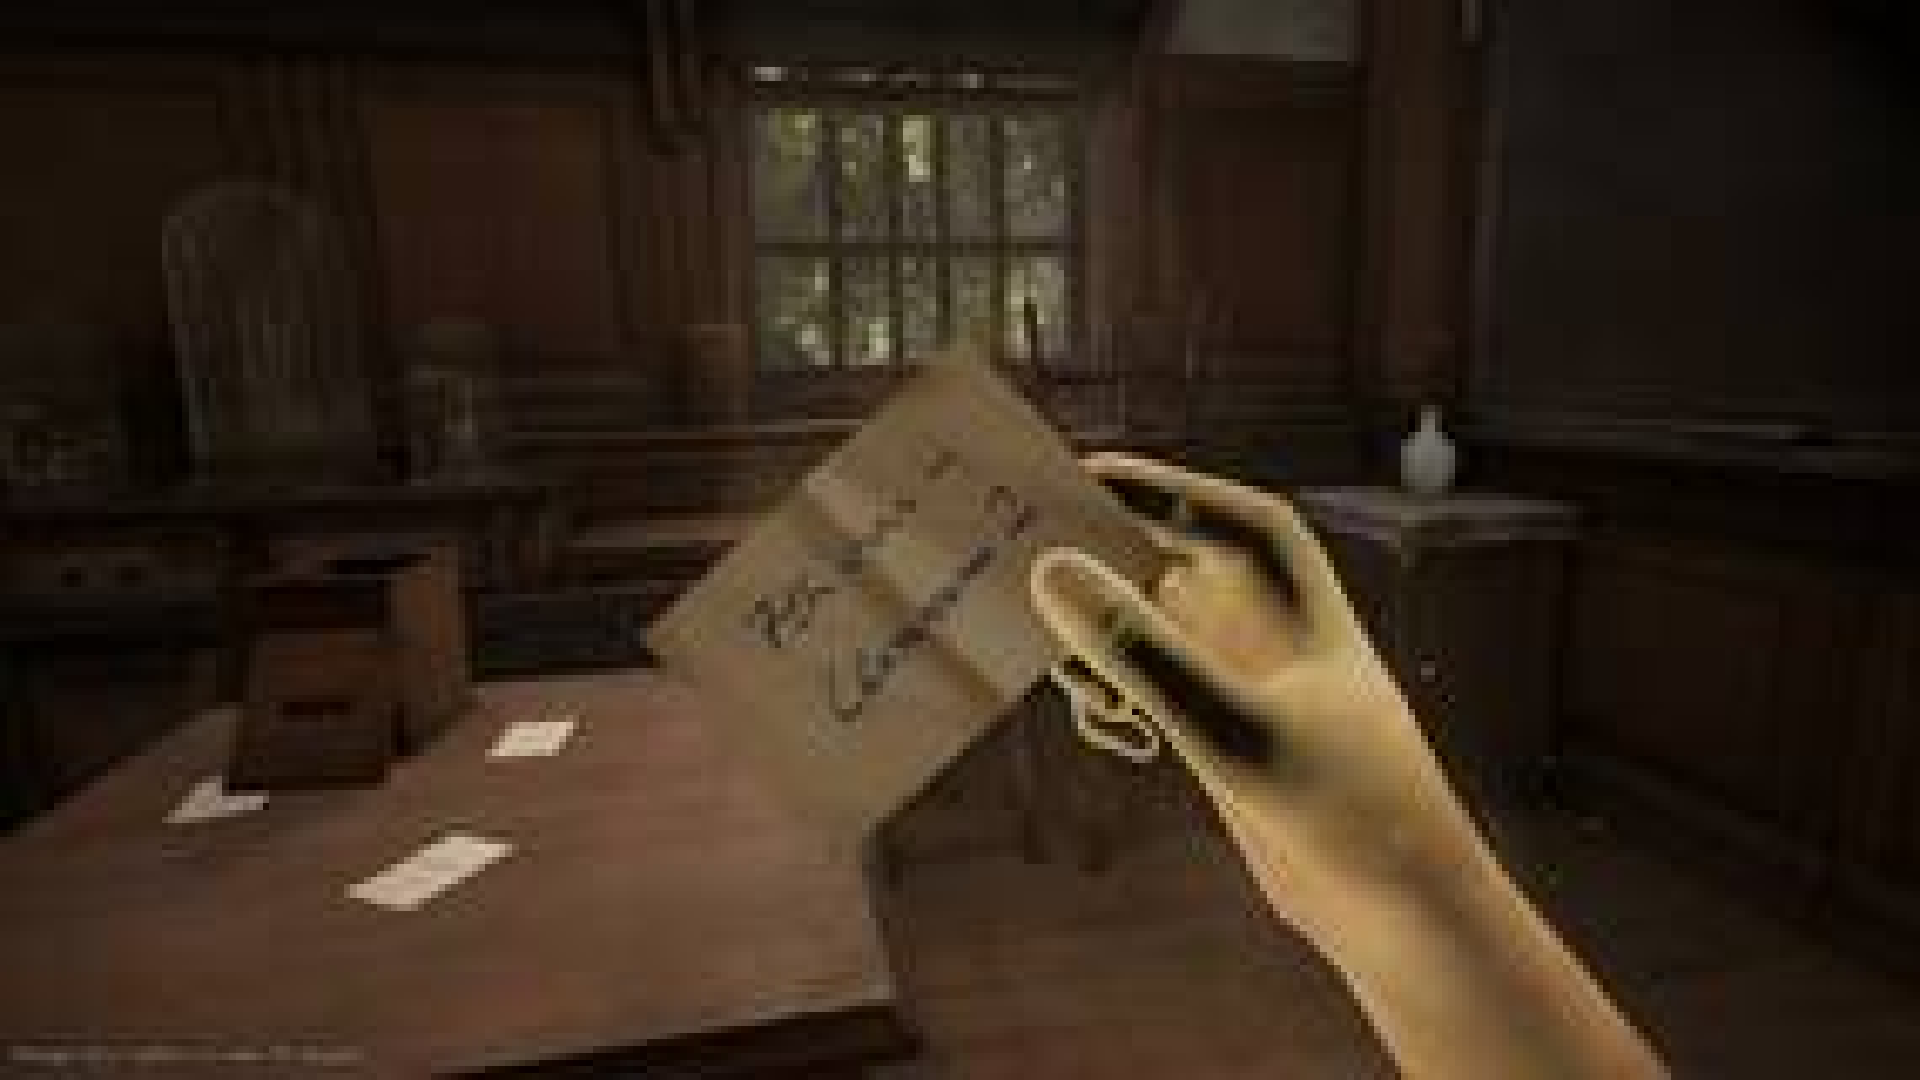 Image for Deracine, the VR game from Dark Souls' director, arrives in November